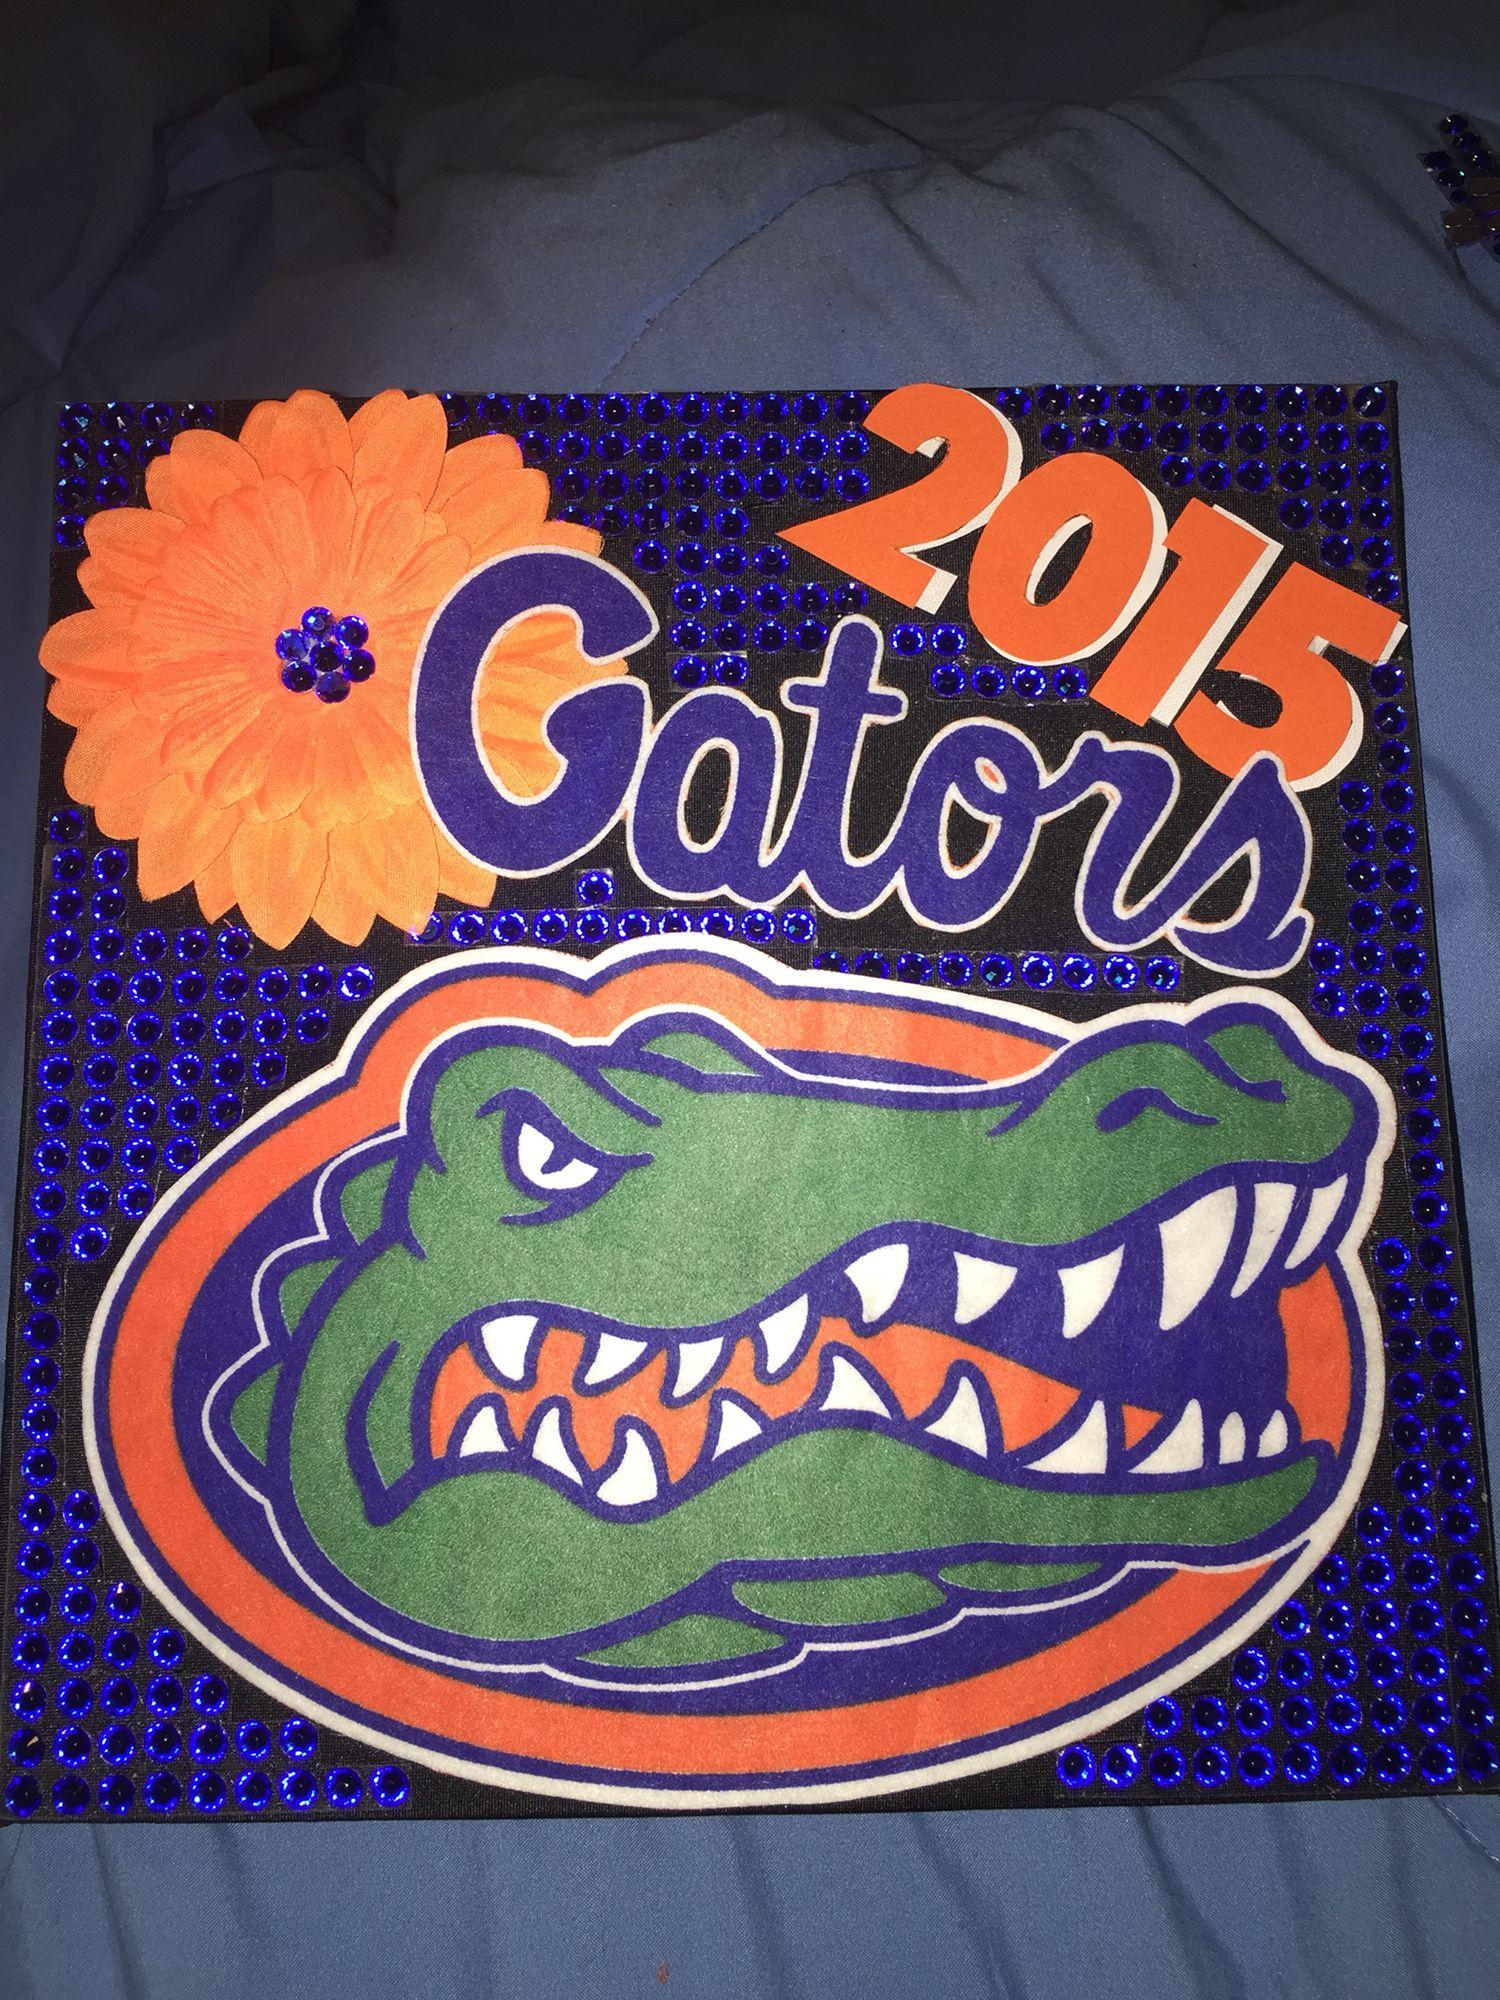 My graduation cap for university of Florida graduation  UF